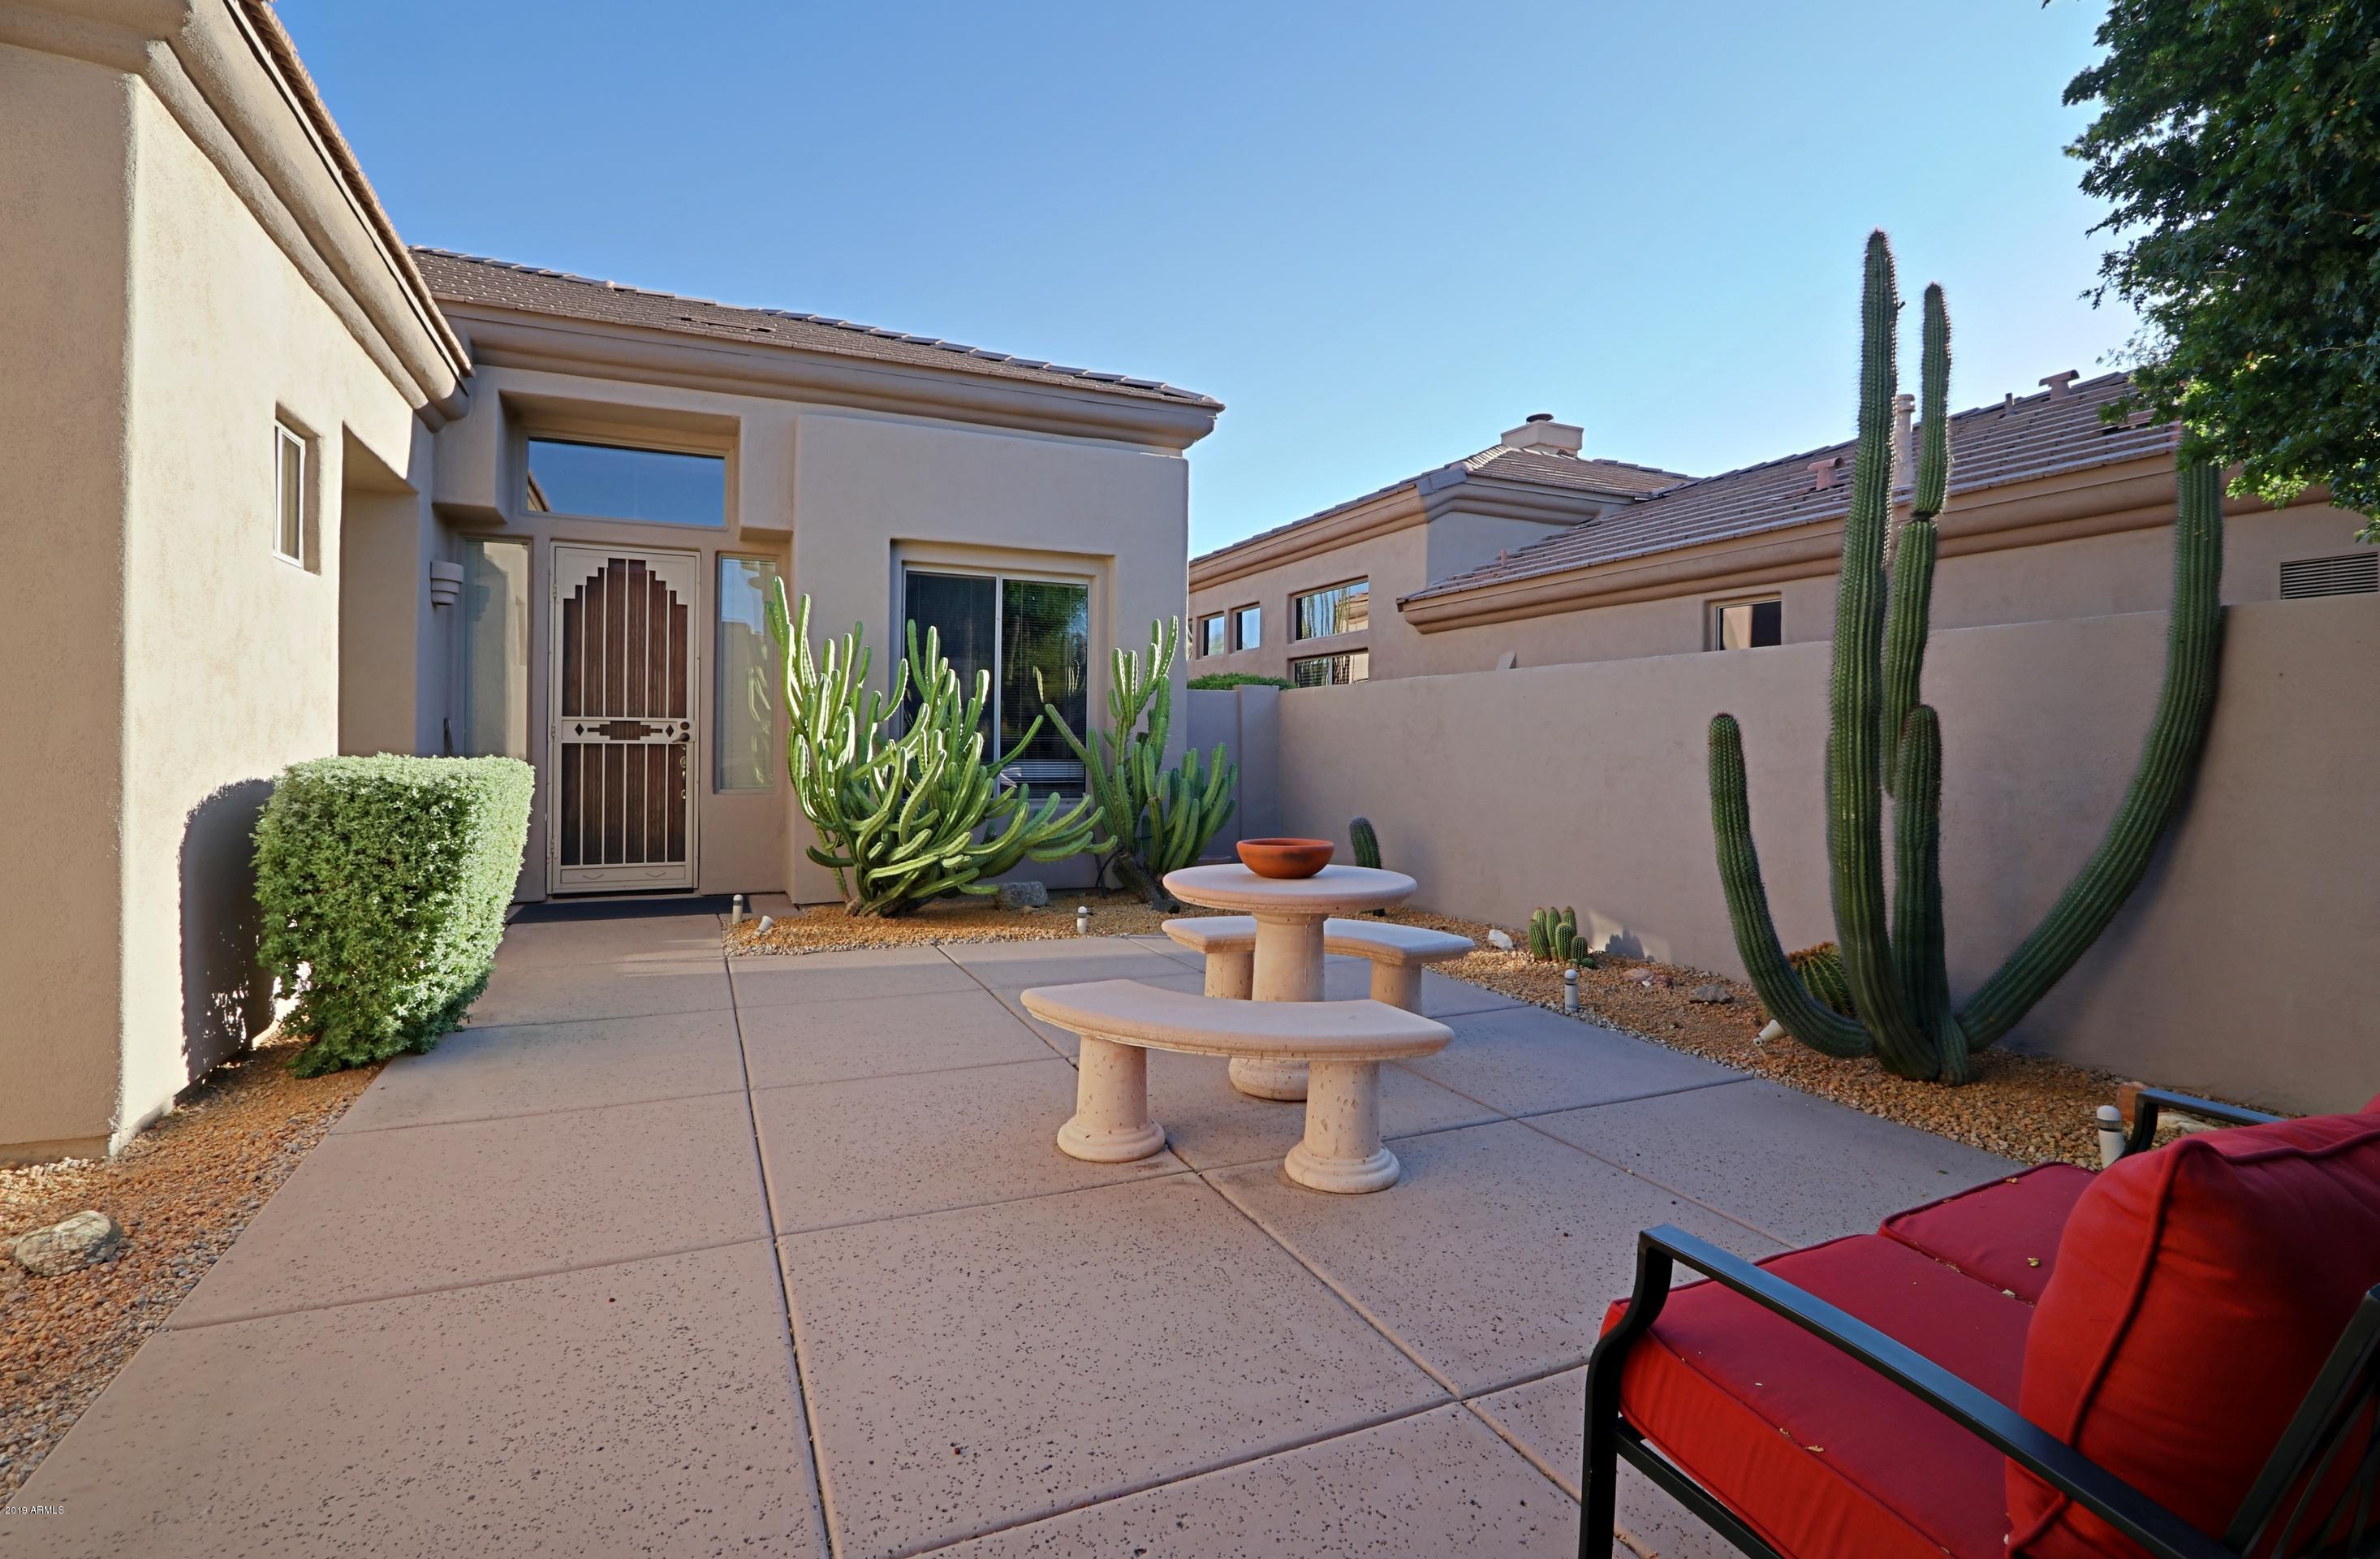 32707 N 70th Street, Scottsdale AZ 85266 - Photo 2